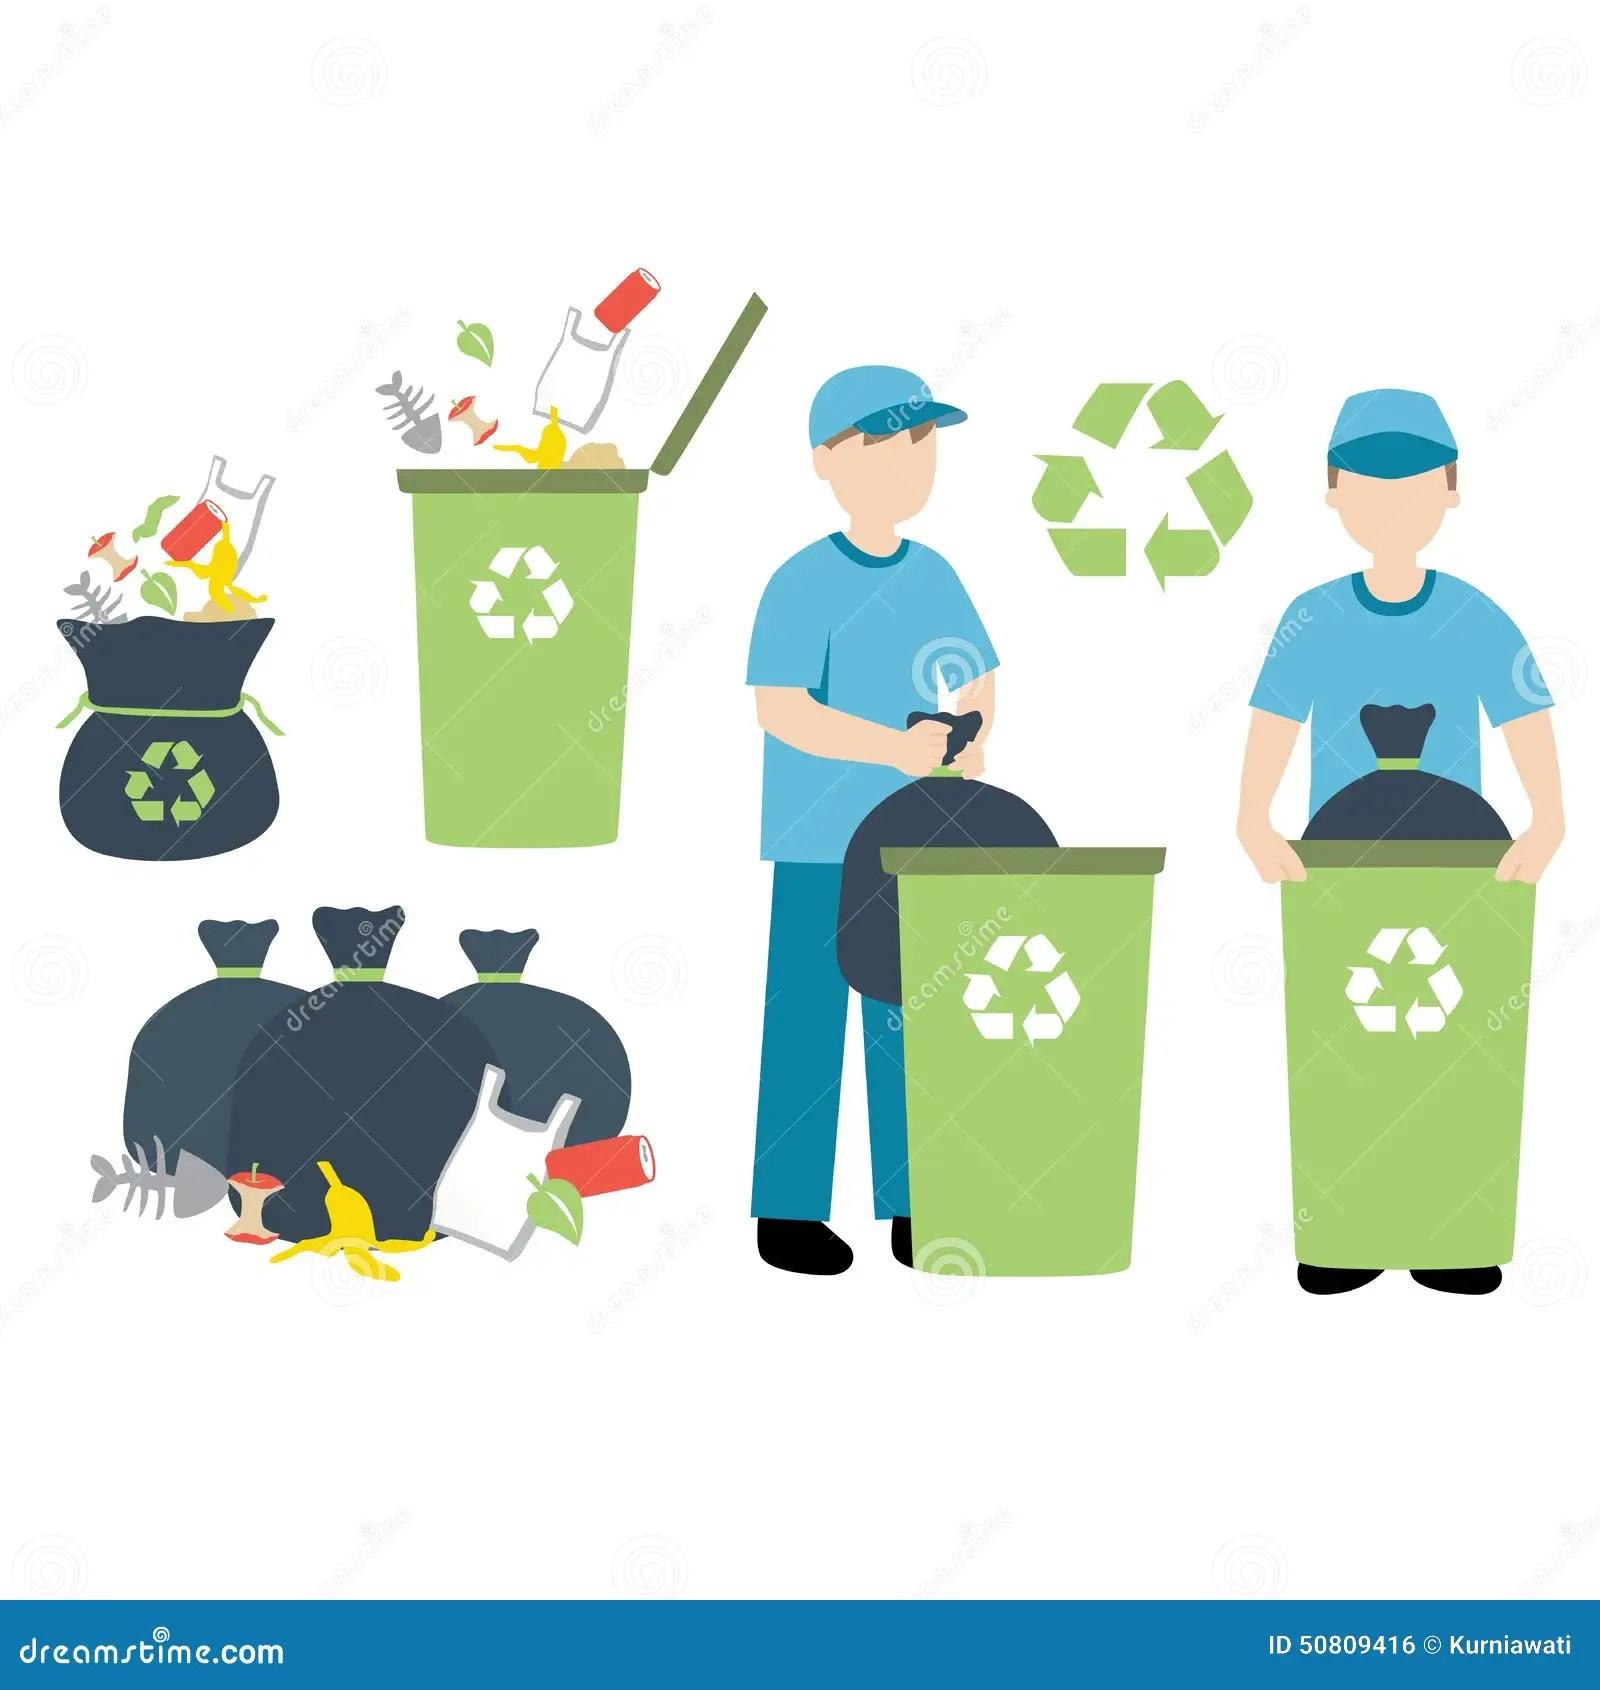 Waste Management Logo Clip Art